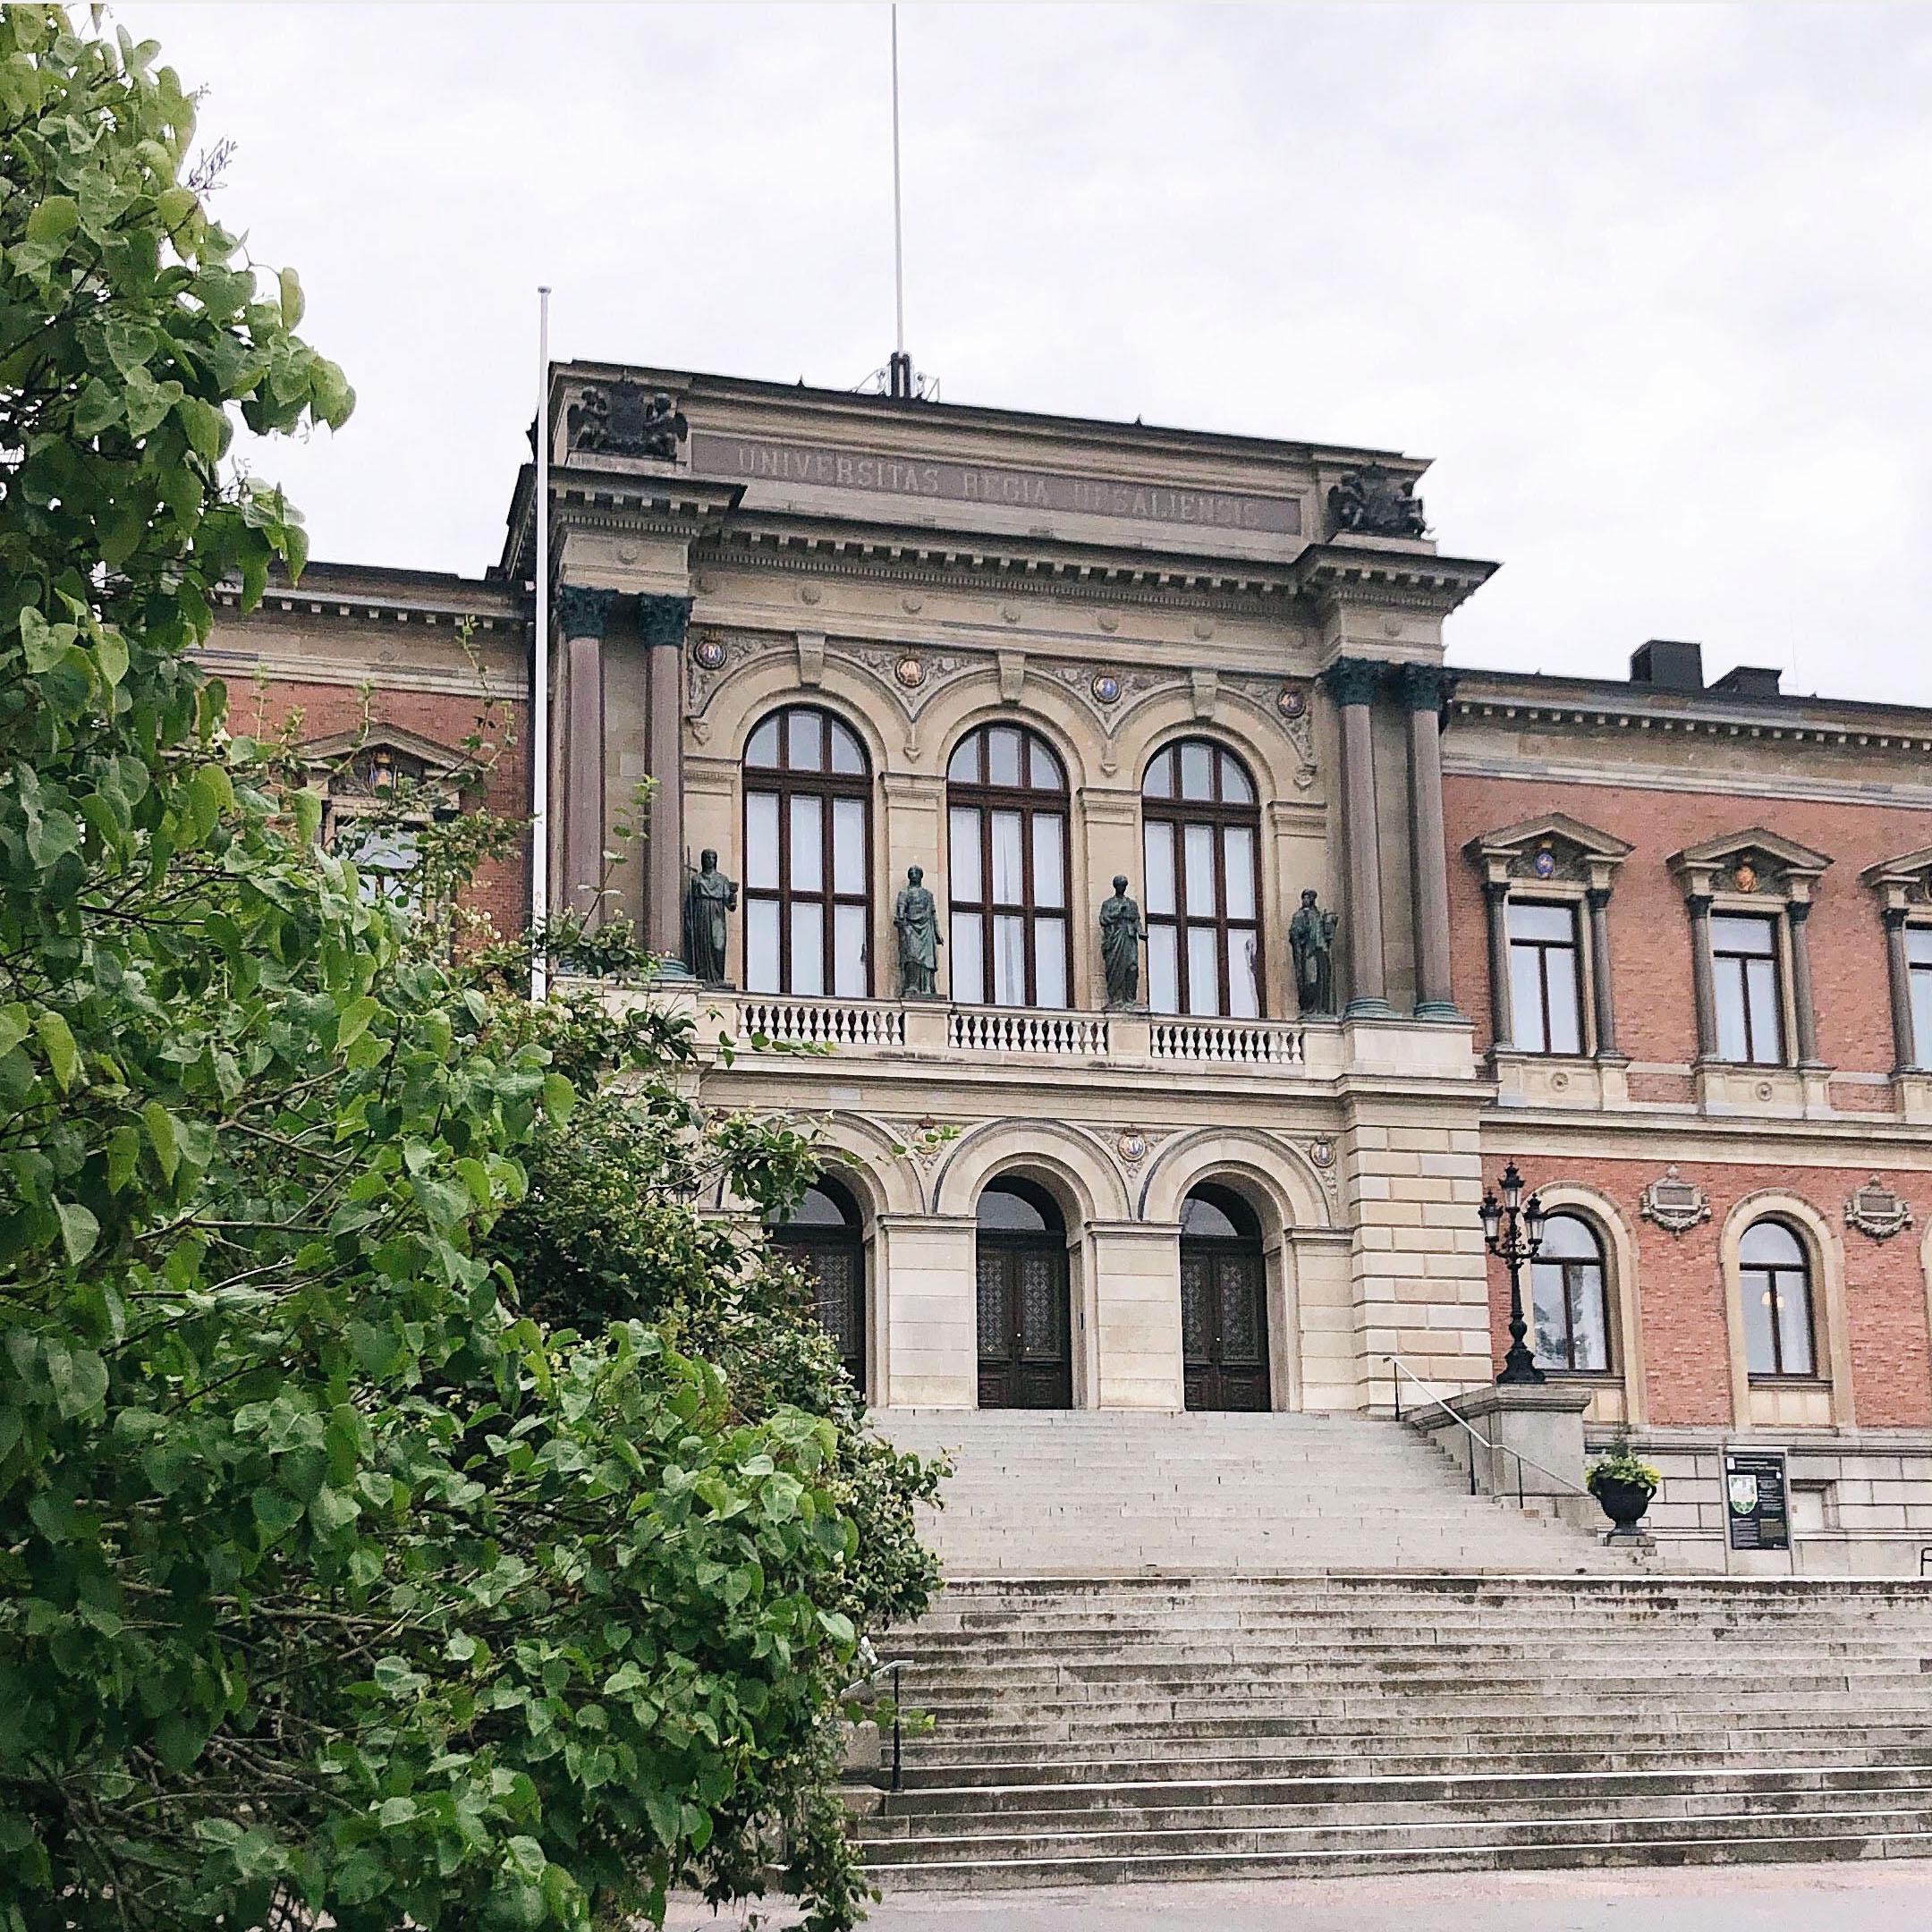 universitetshuset Lovisa Svensson2.jpg